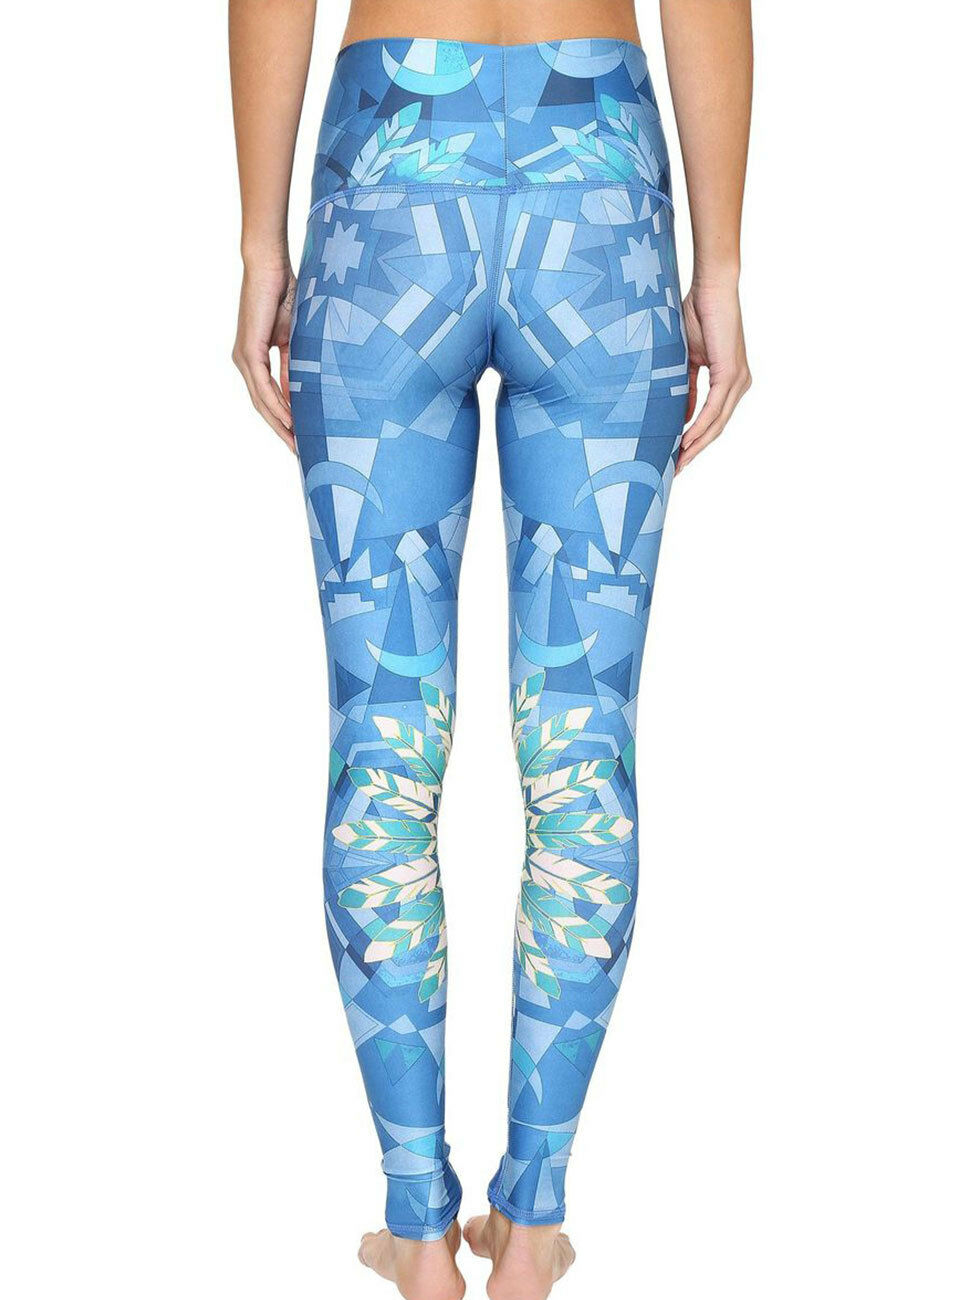 Teeki Yoga Pants bluee Lightning In A Bottle Large Pilates Fitness Gym Made USA